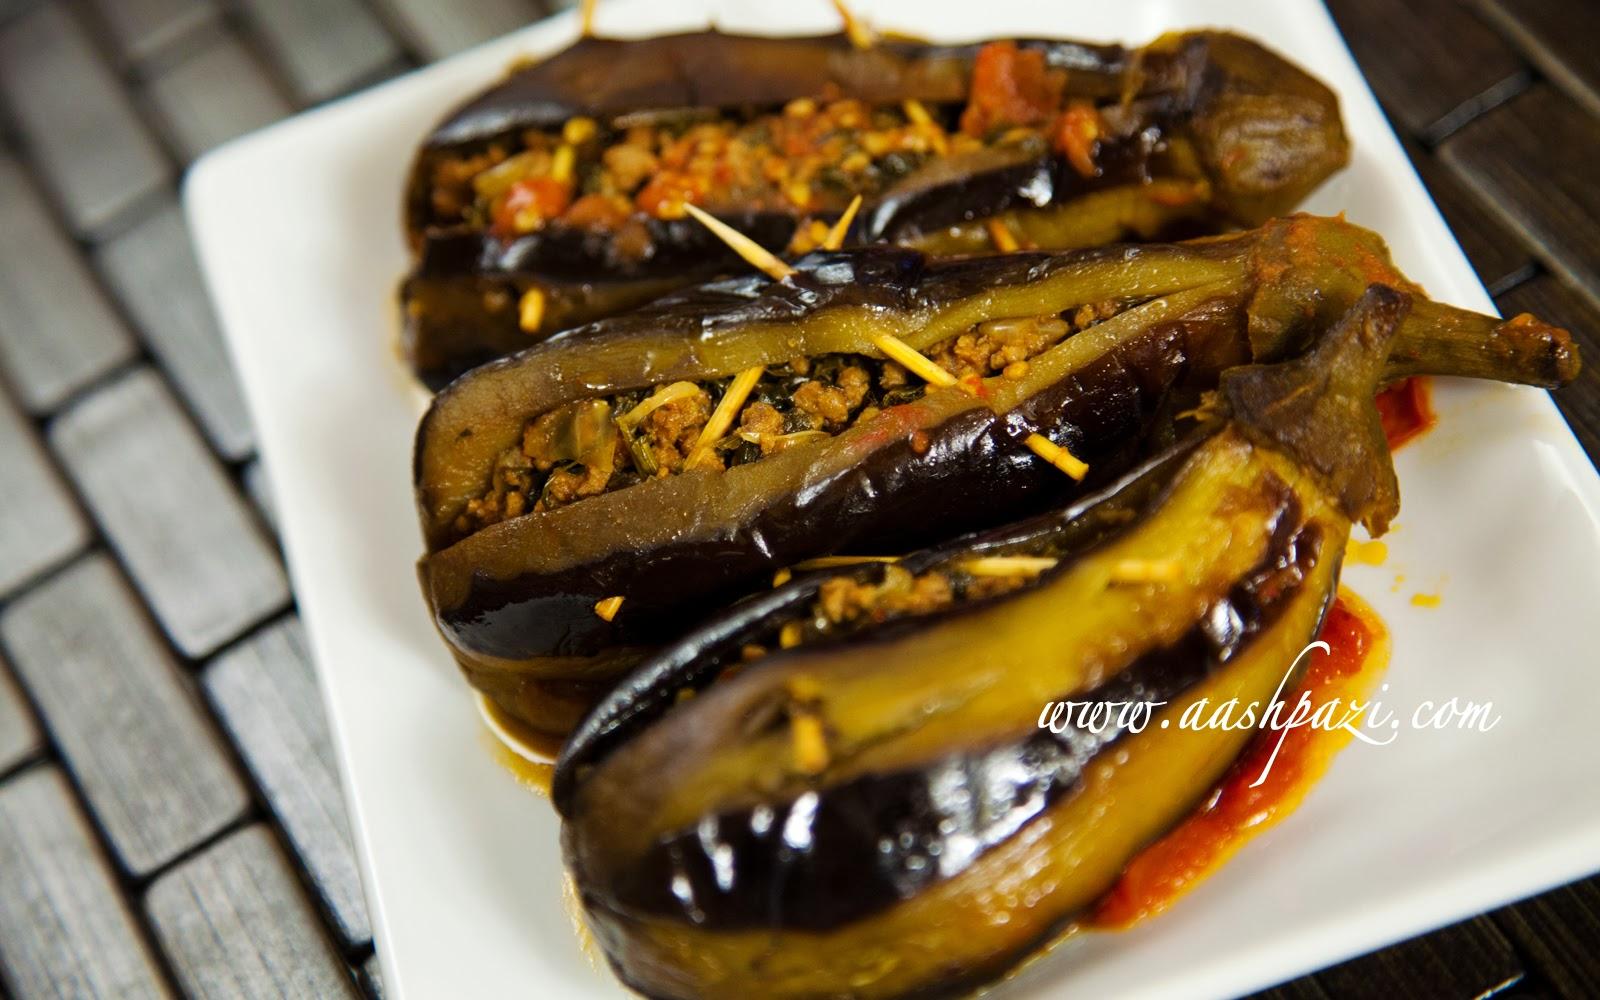 Stuffed Eggplant Recipe Aashpazi